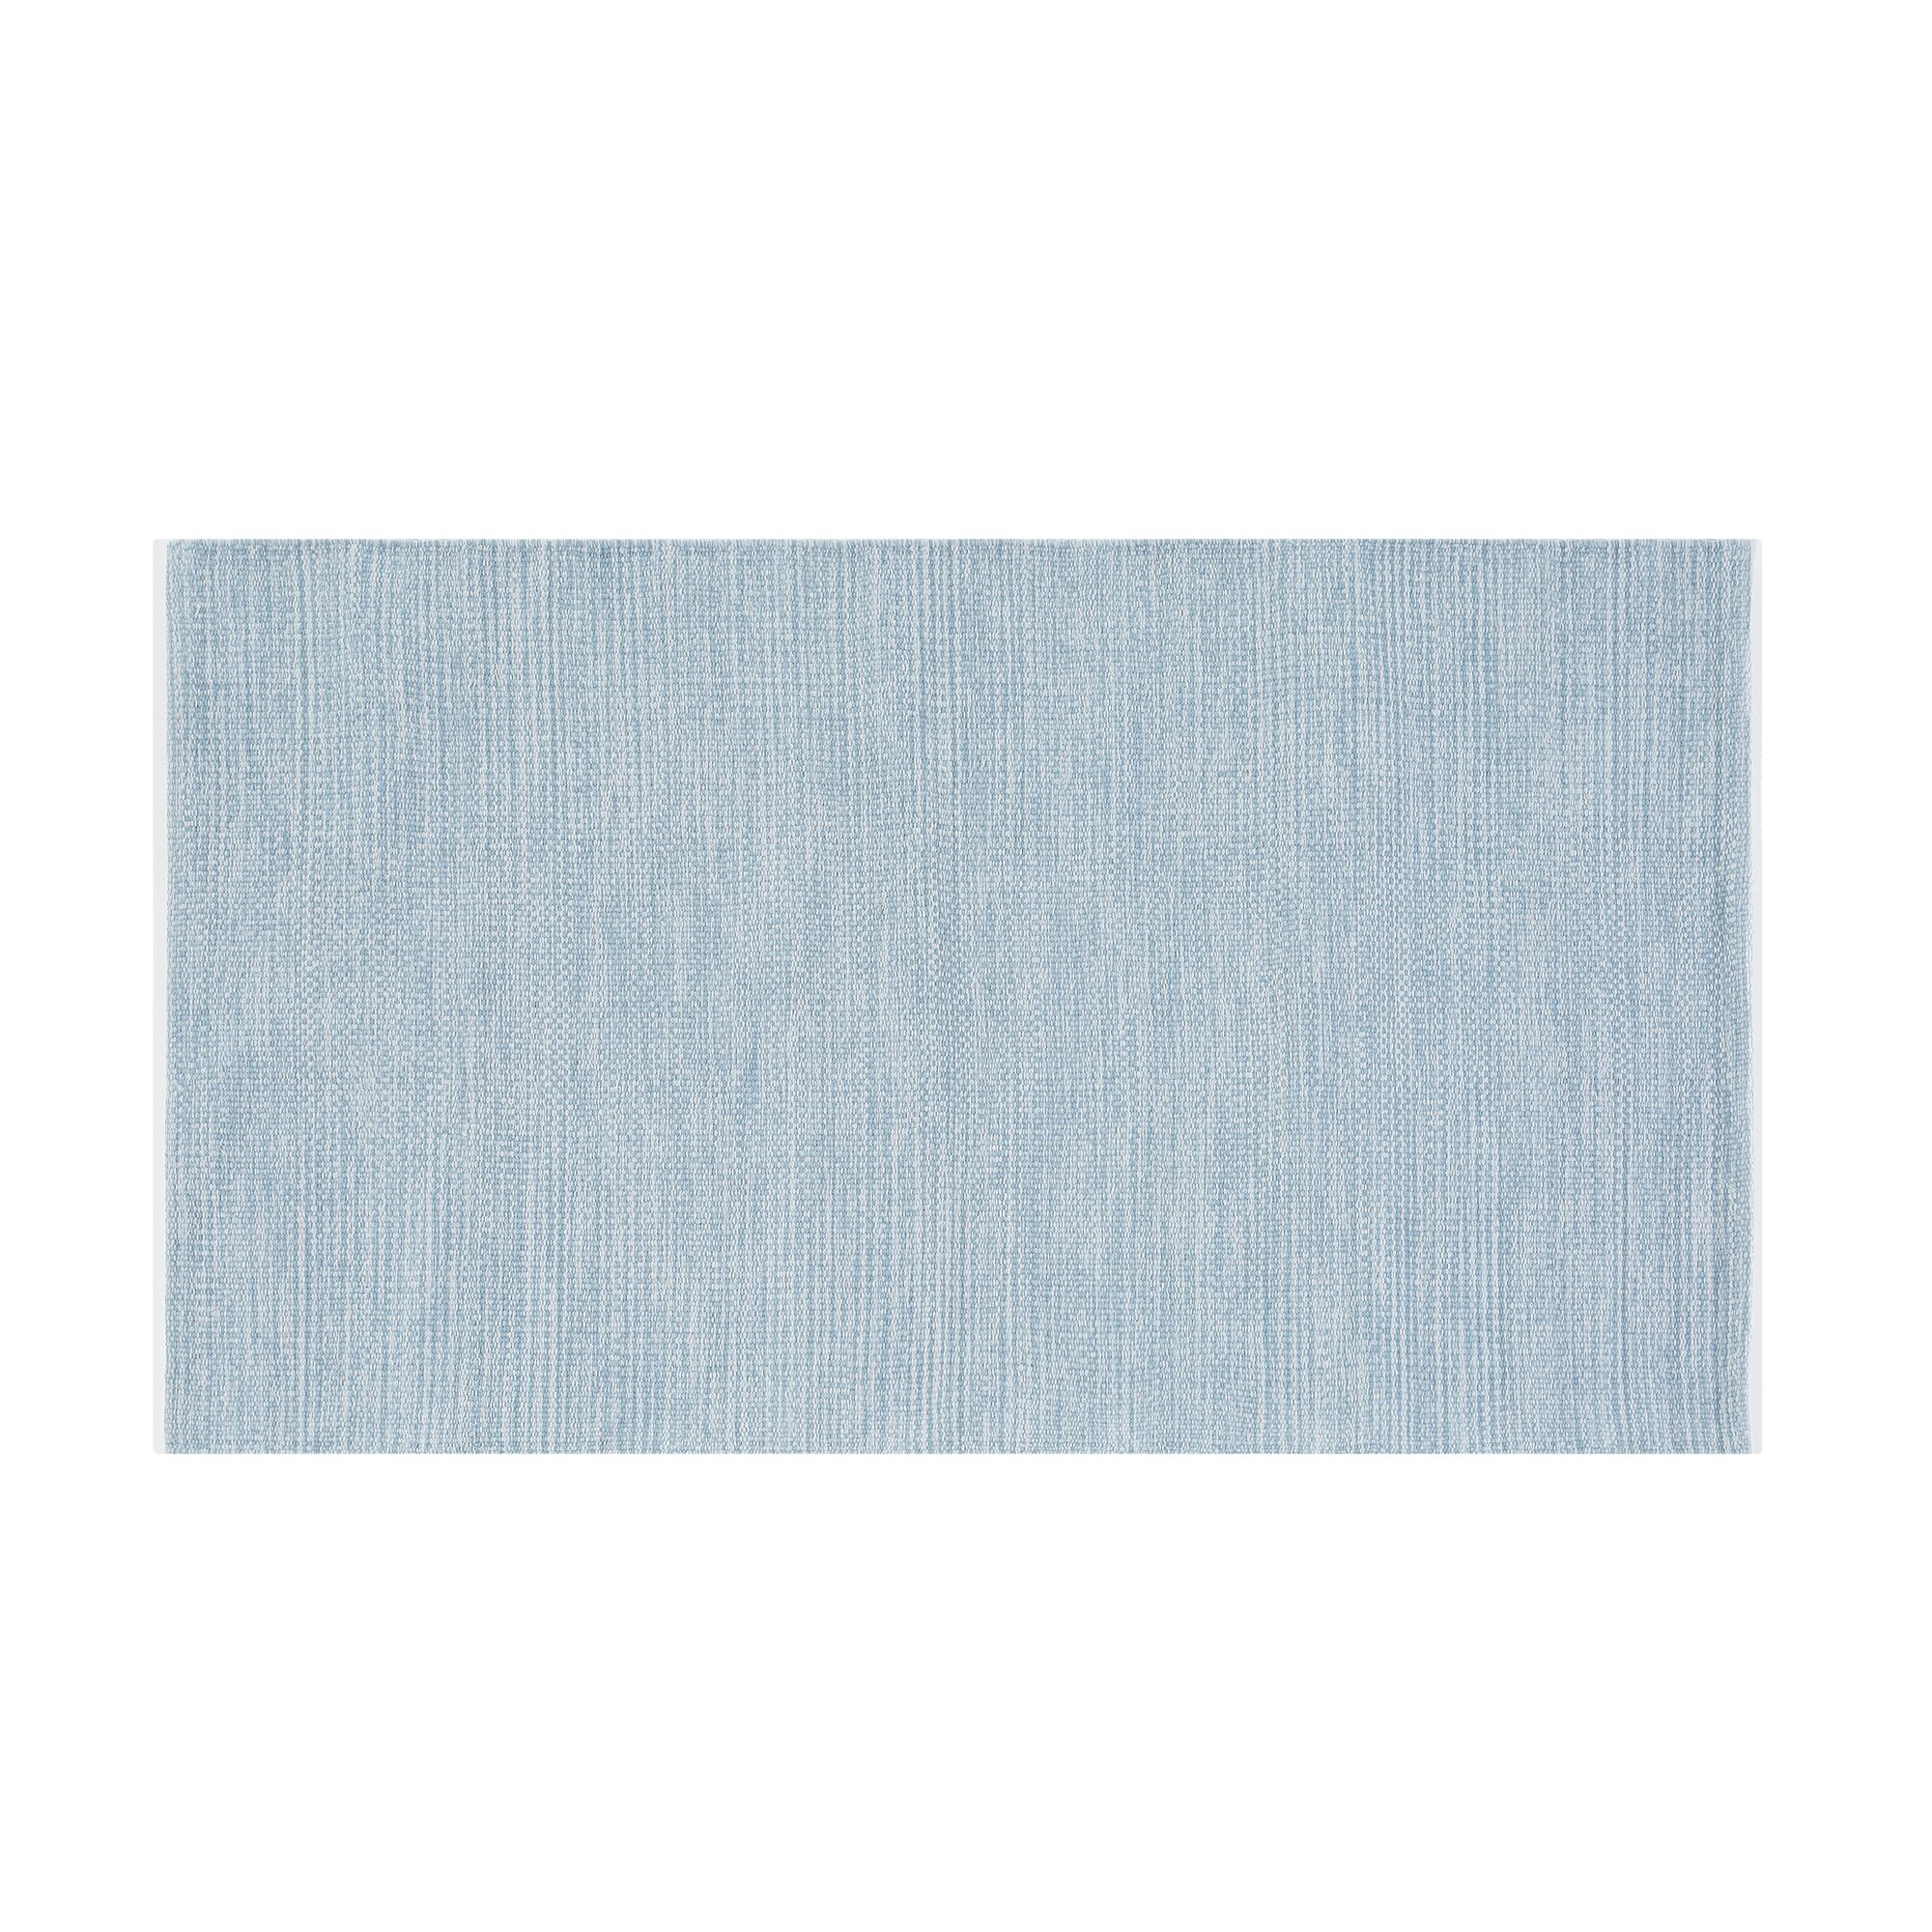 home loft concept handgewebter teppich derince in hellblau. Black Bedroom Furniture Sets. Home Design Ideas